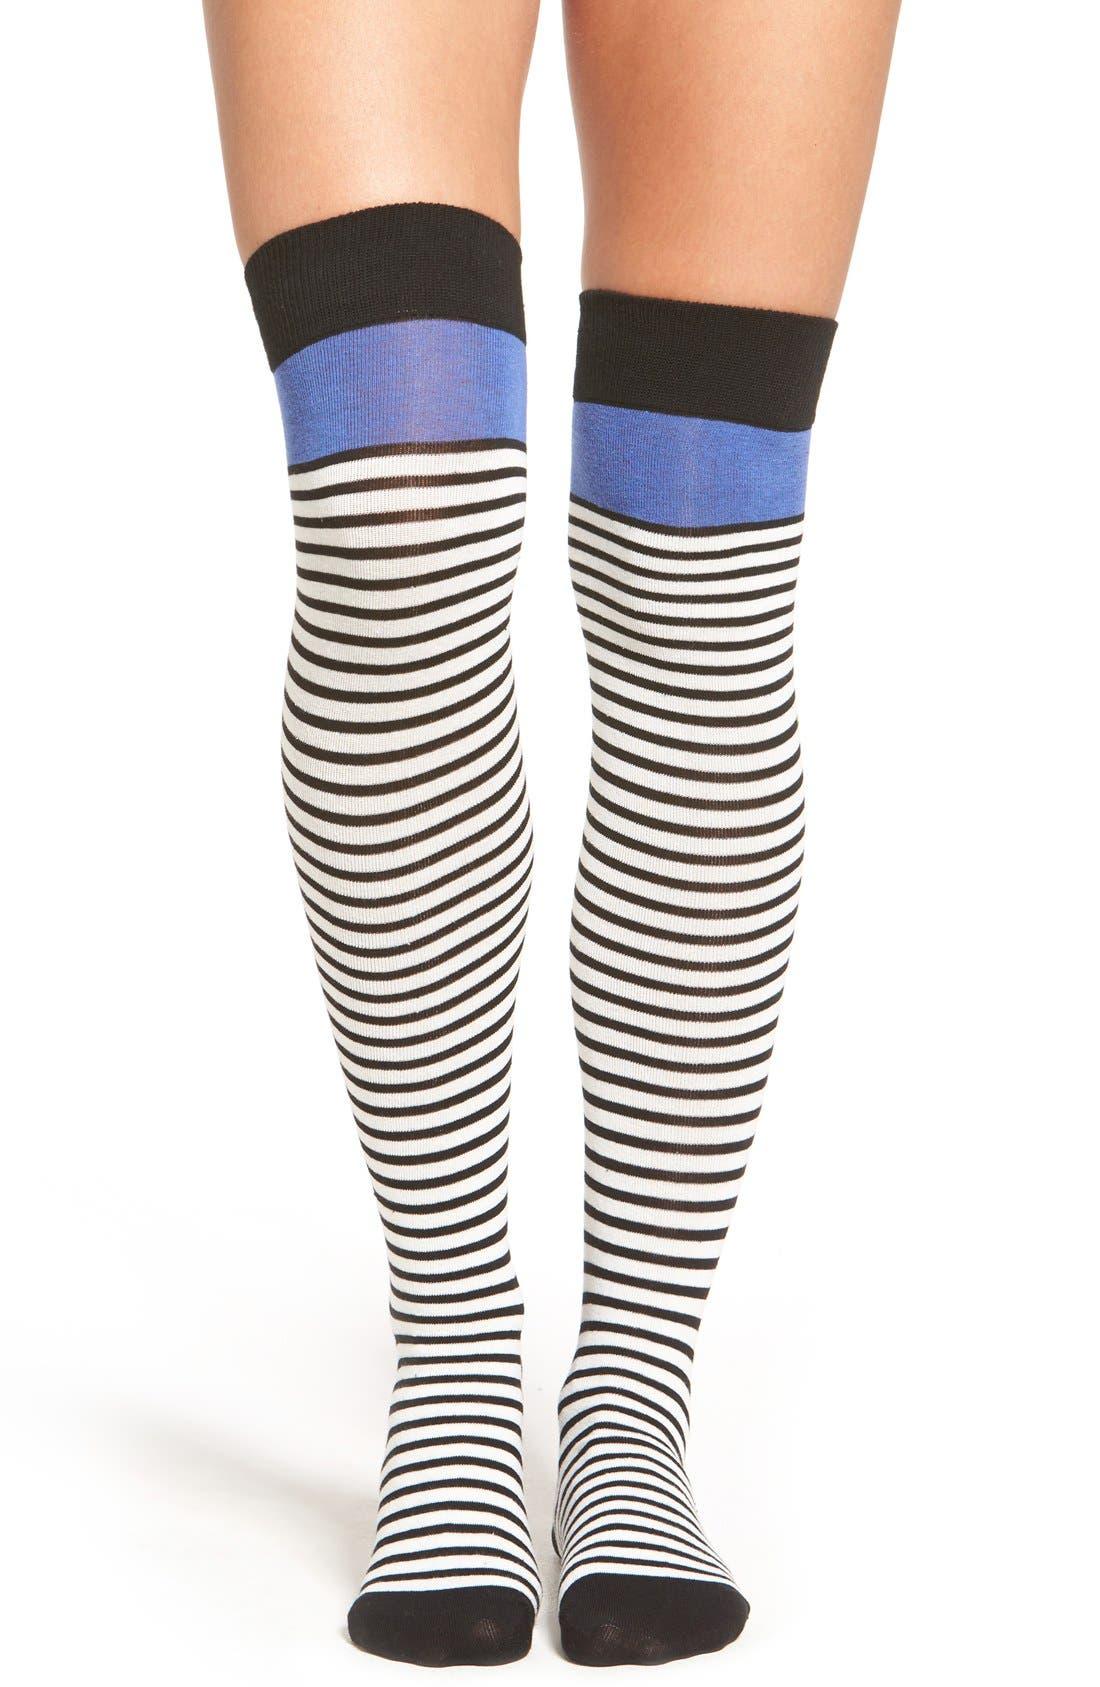 Alternate Image 1 Selected - kate spade new york 'scuba' stripe over-the-knee socks